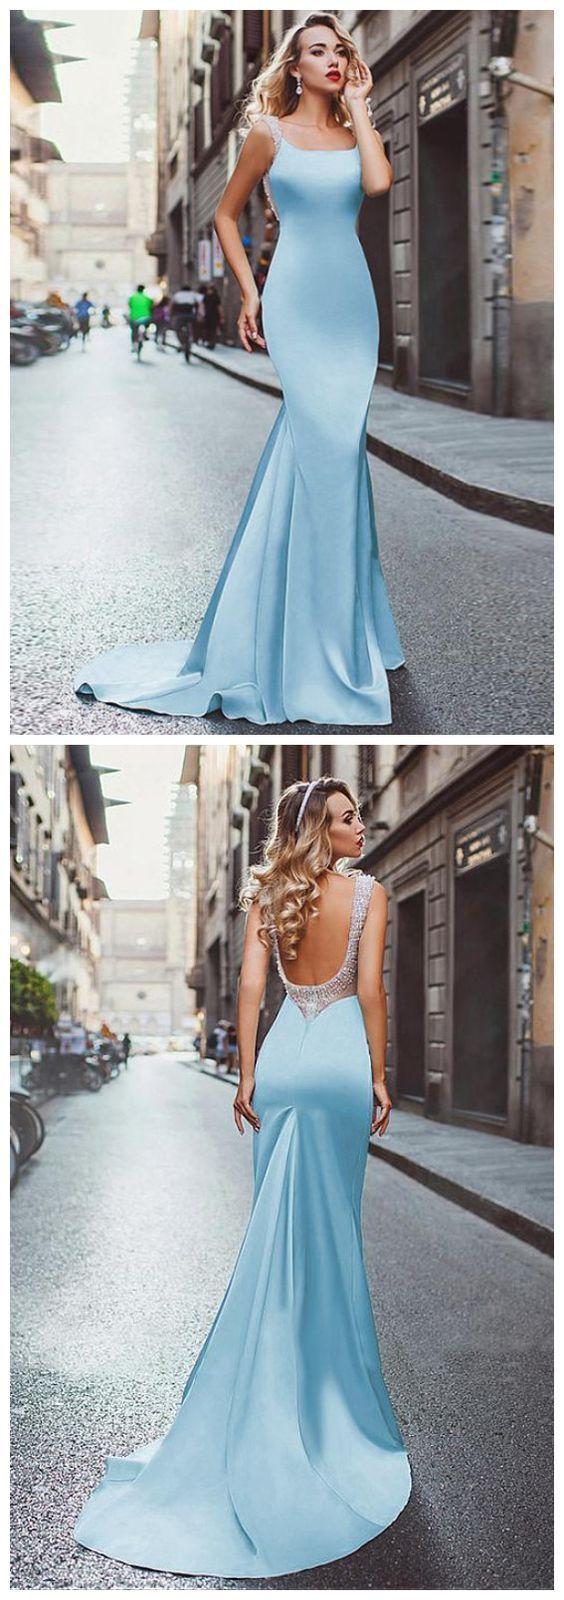 CHIC MERMAID PROM DRESSES LIGHT SKY BLUE STRAPS MODEST LONG PROM ...